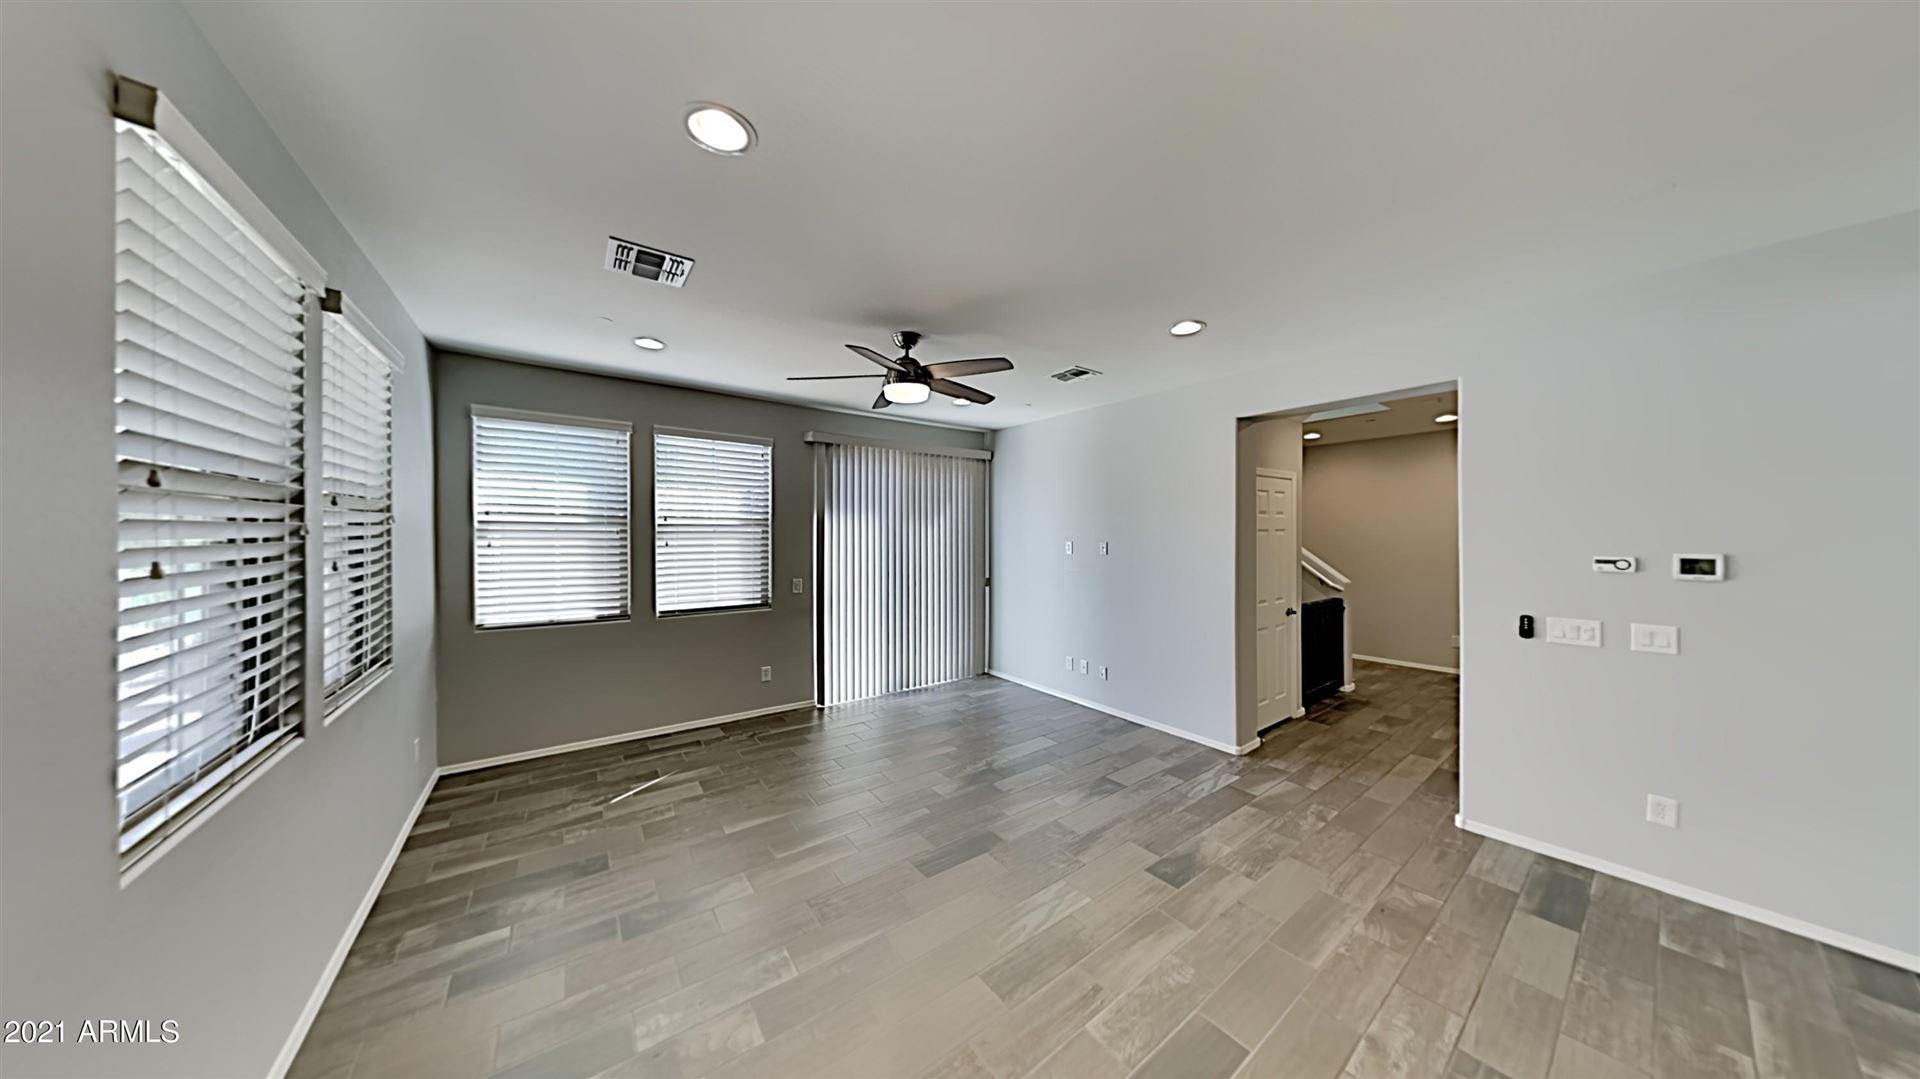 Photo of 309 N 56TH Place, Mesa, AZ 85205 (MLS # 6200648)